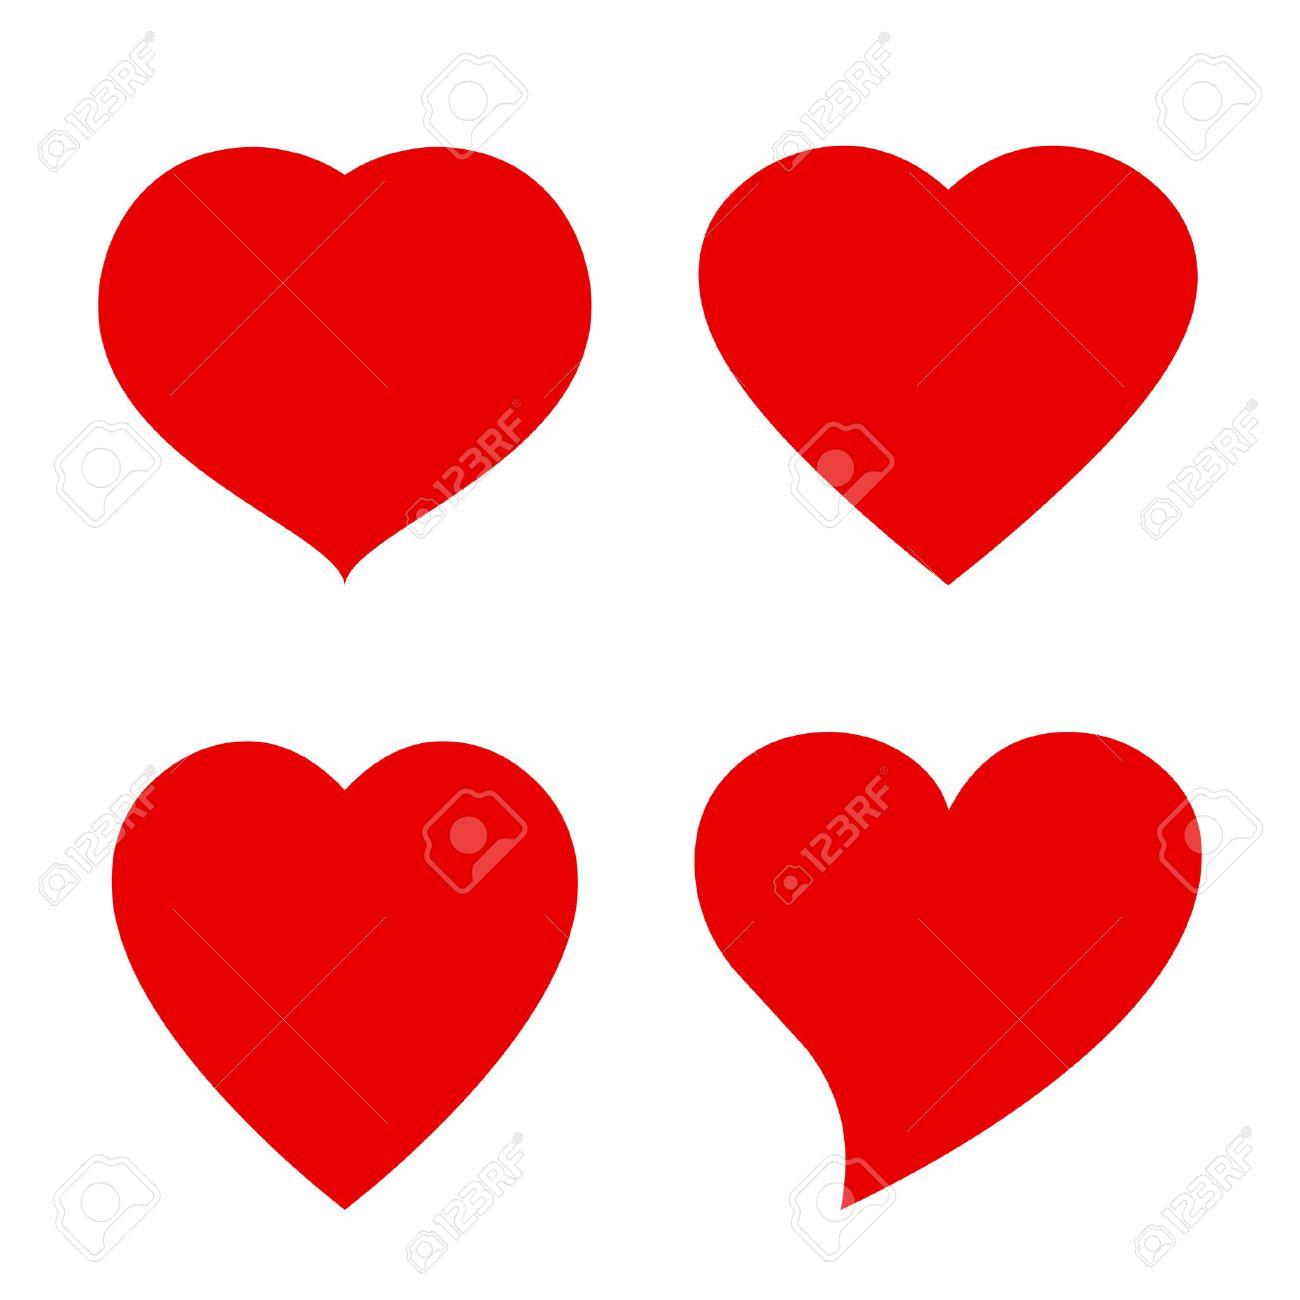 Vector heart shape icon - 52082768